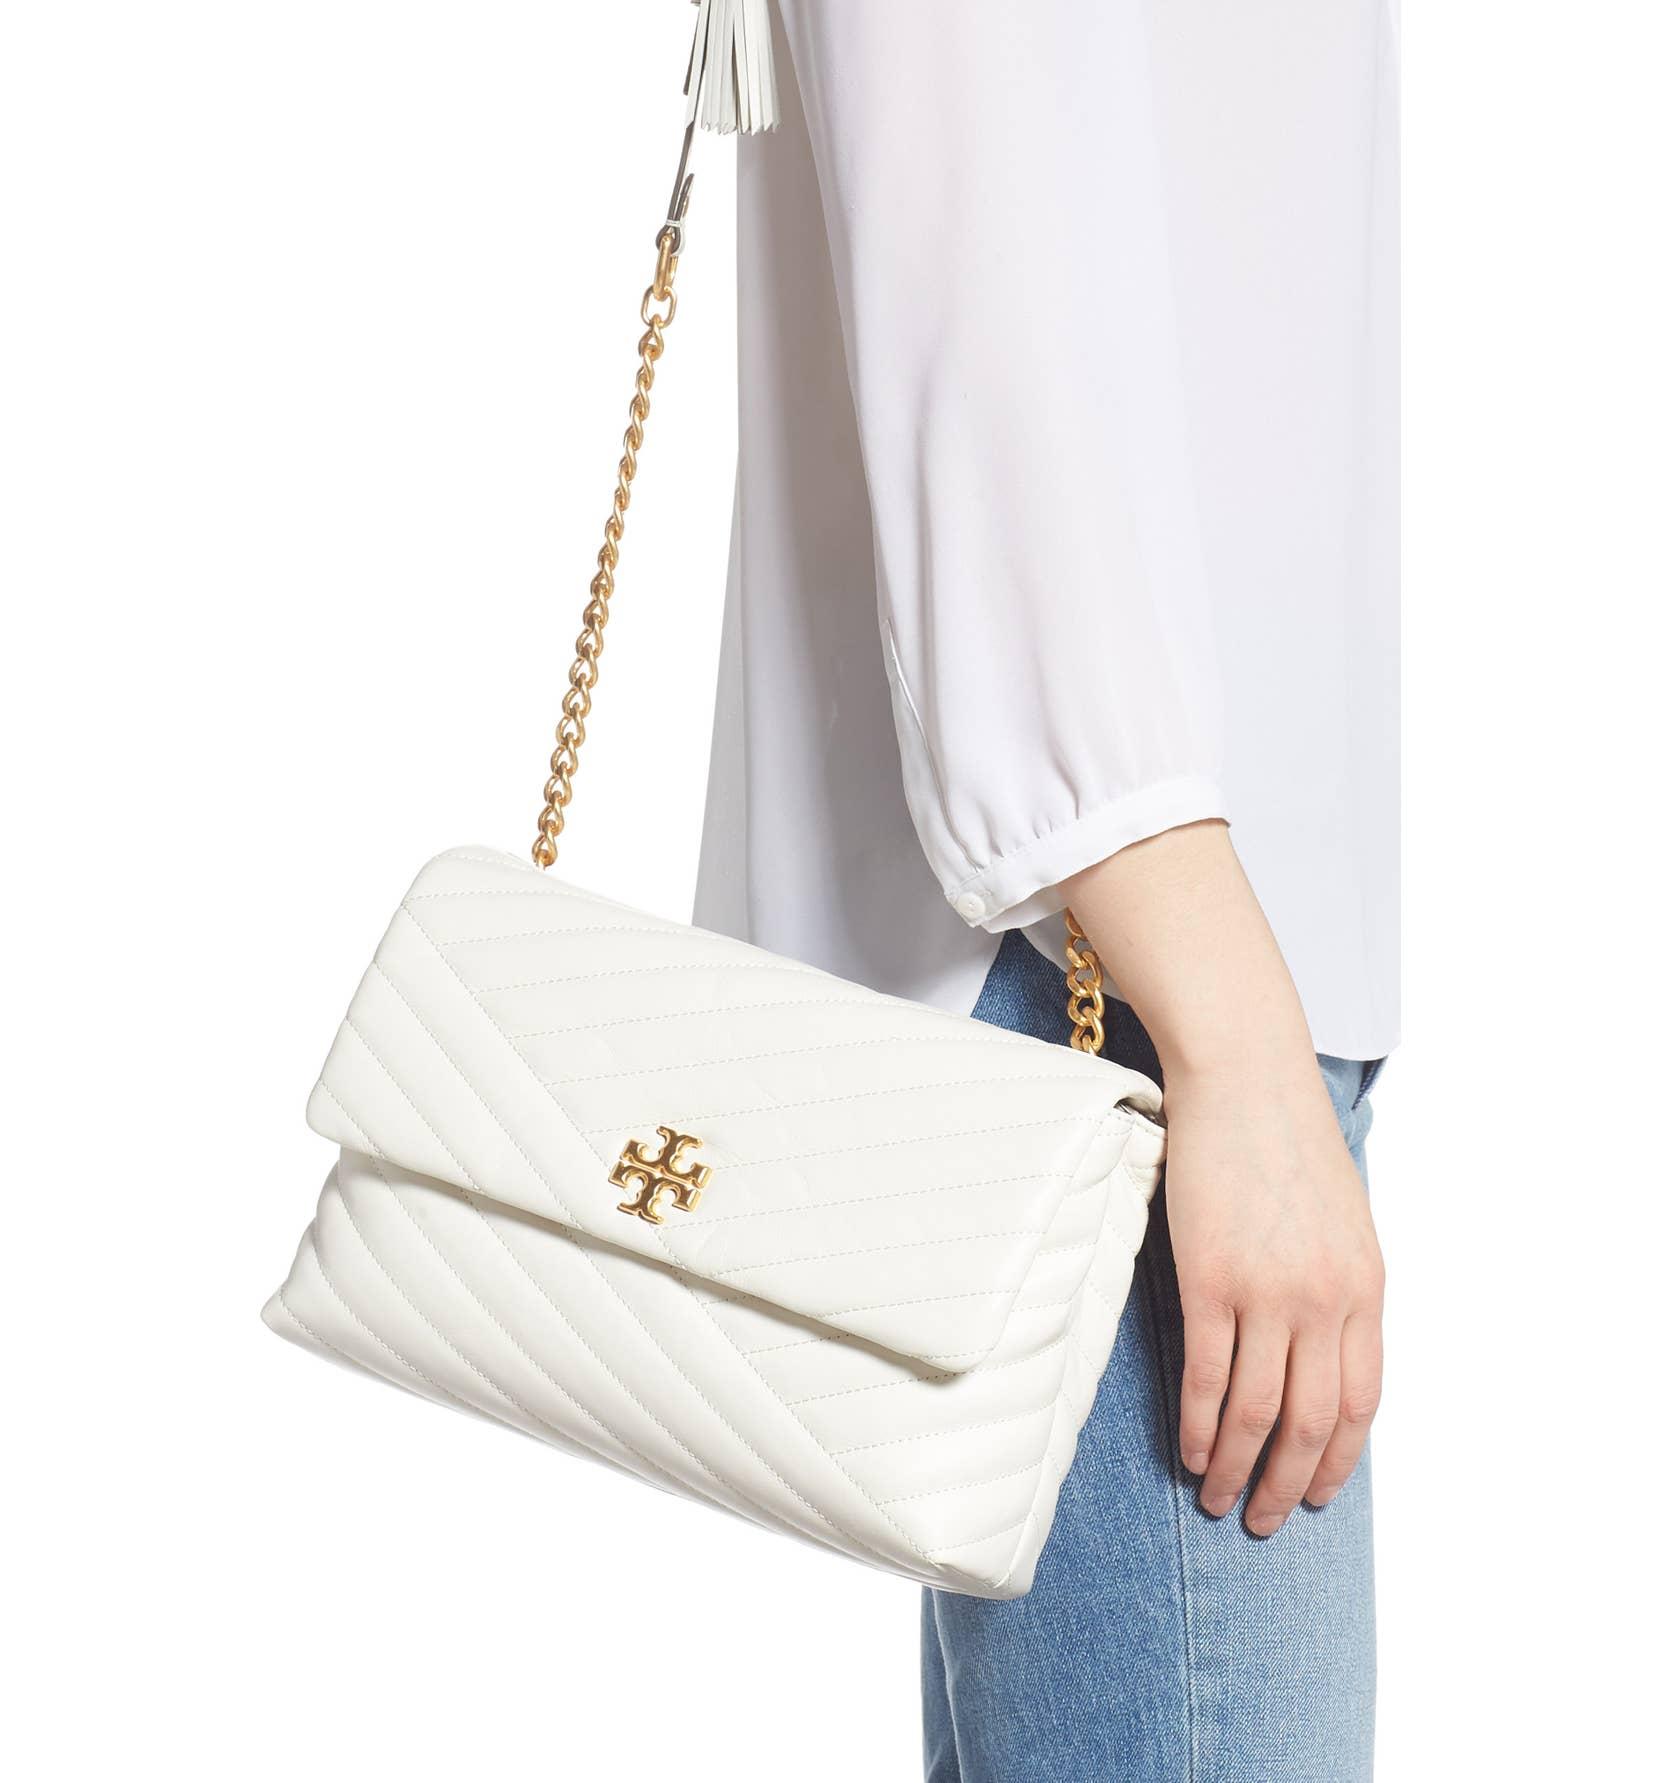 3d620c3ceca1 472 TORY BURCH Kira Chevron Flap Shoulder Bag NEW IVORY